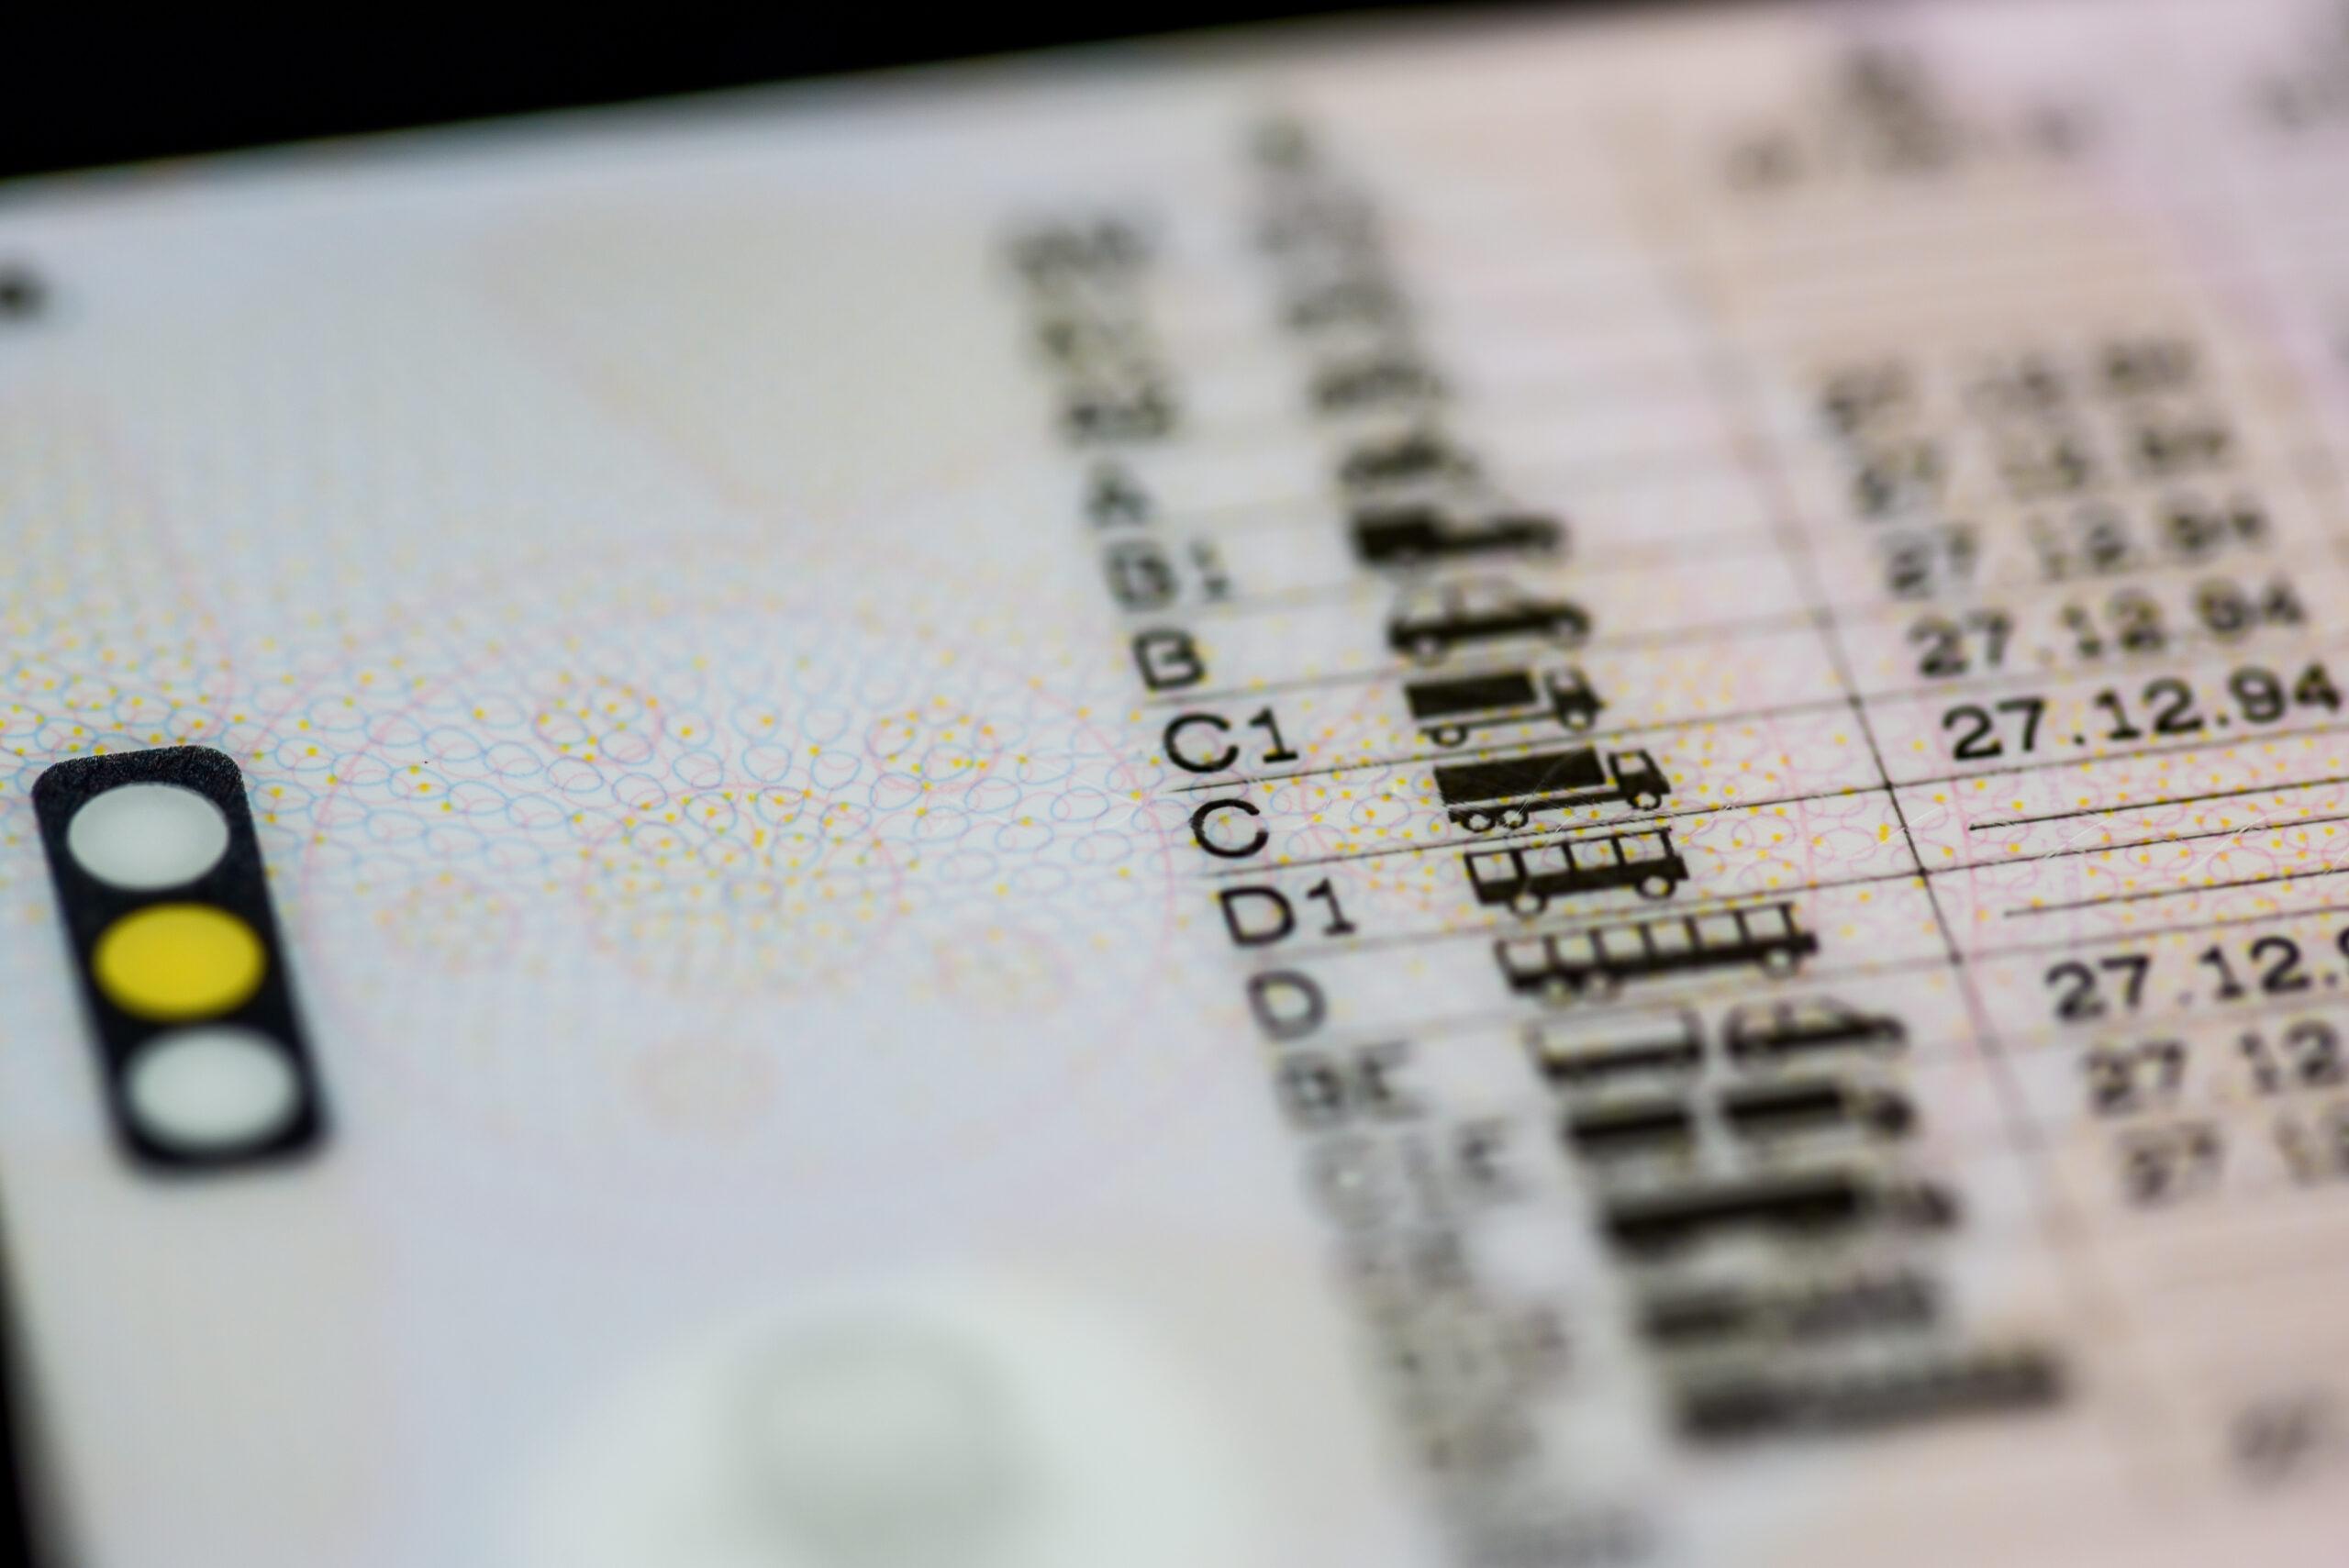 Patente per Camper in Italia: Regole e Limiti